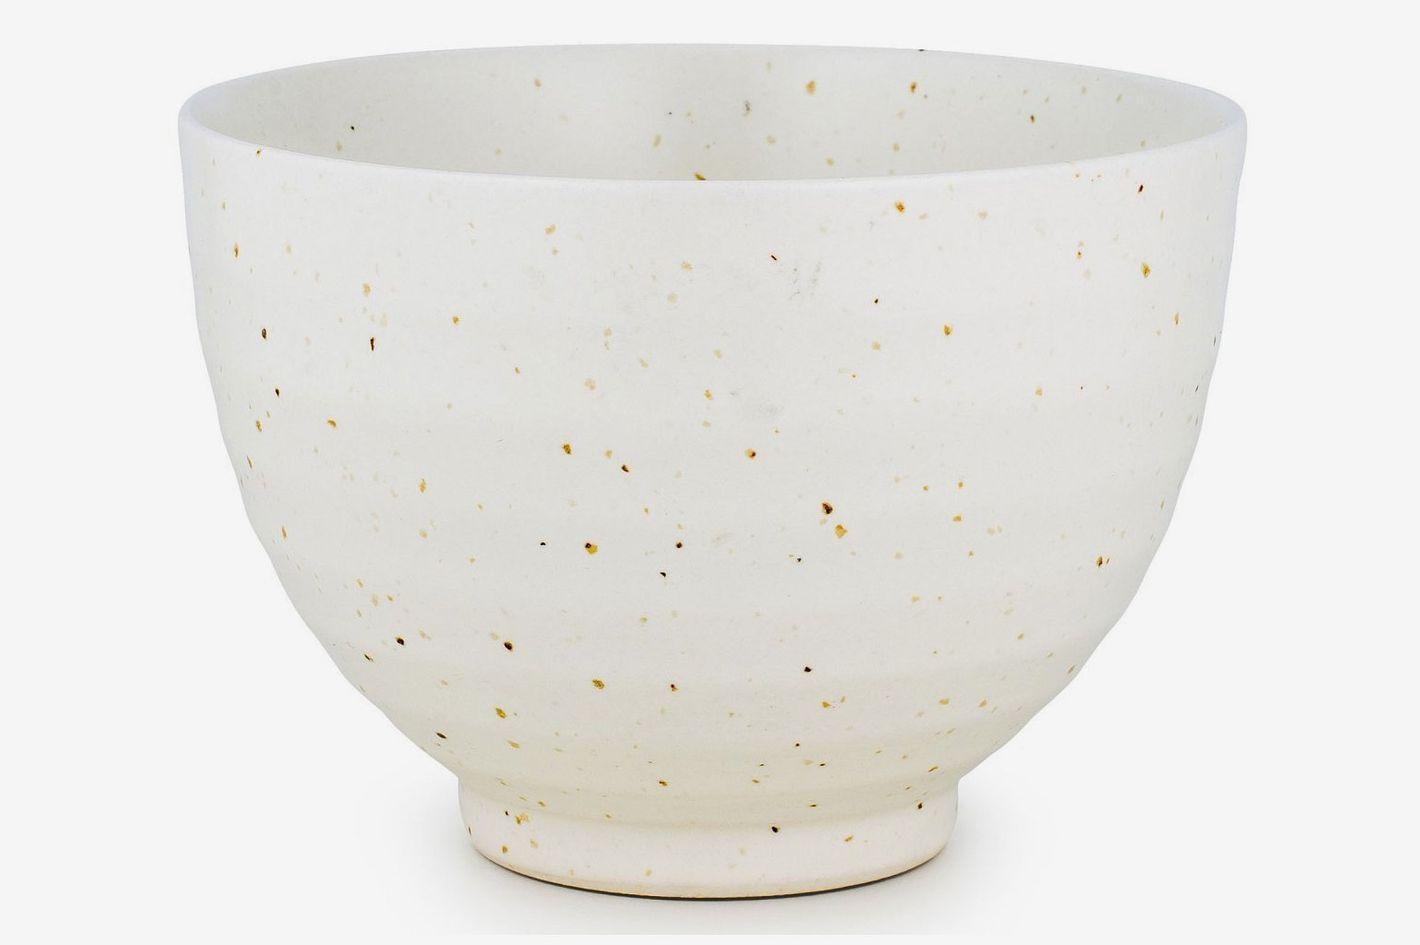 Matcha DNA Handcrafted Matcha Tea Bowl